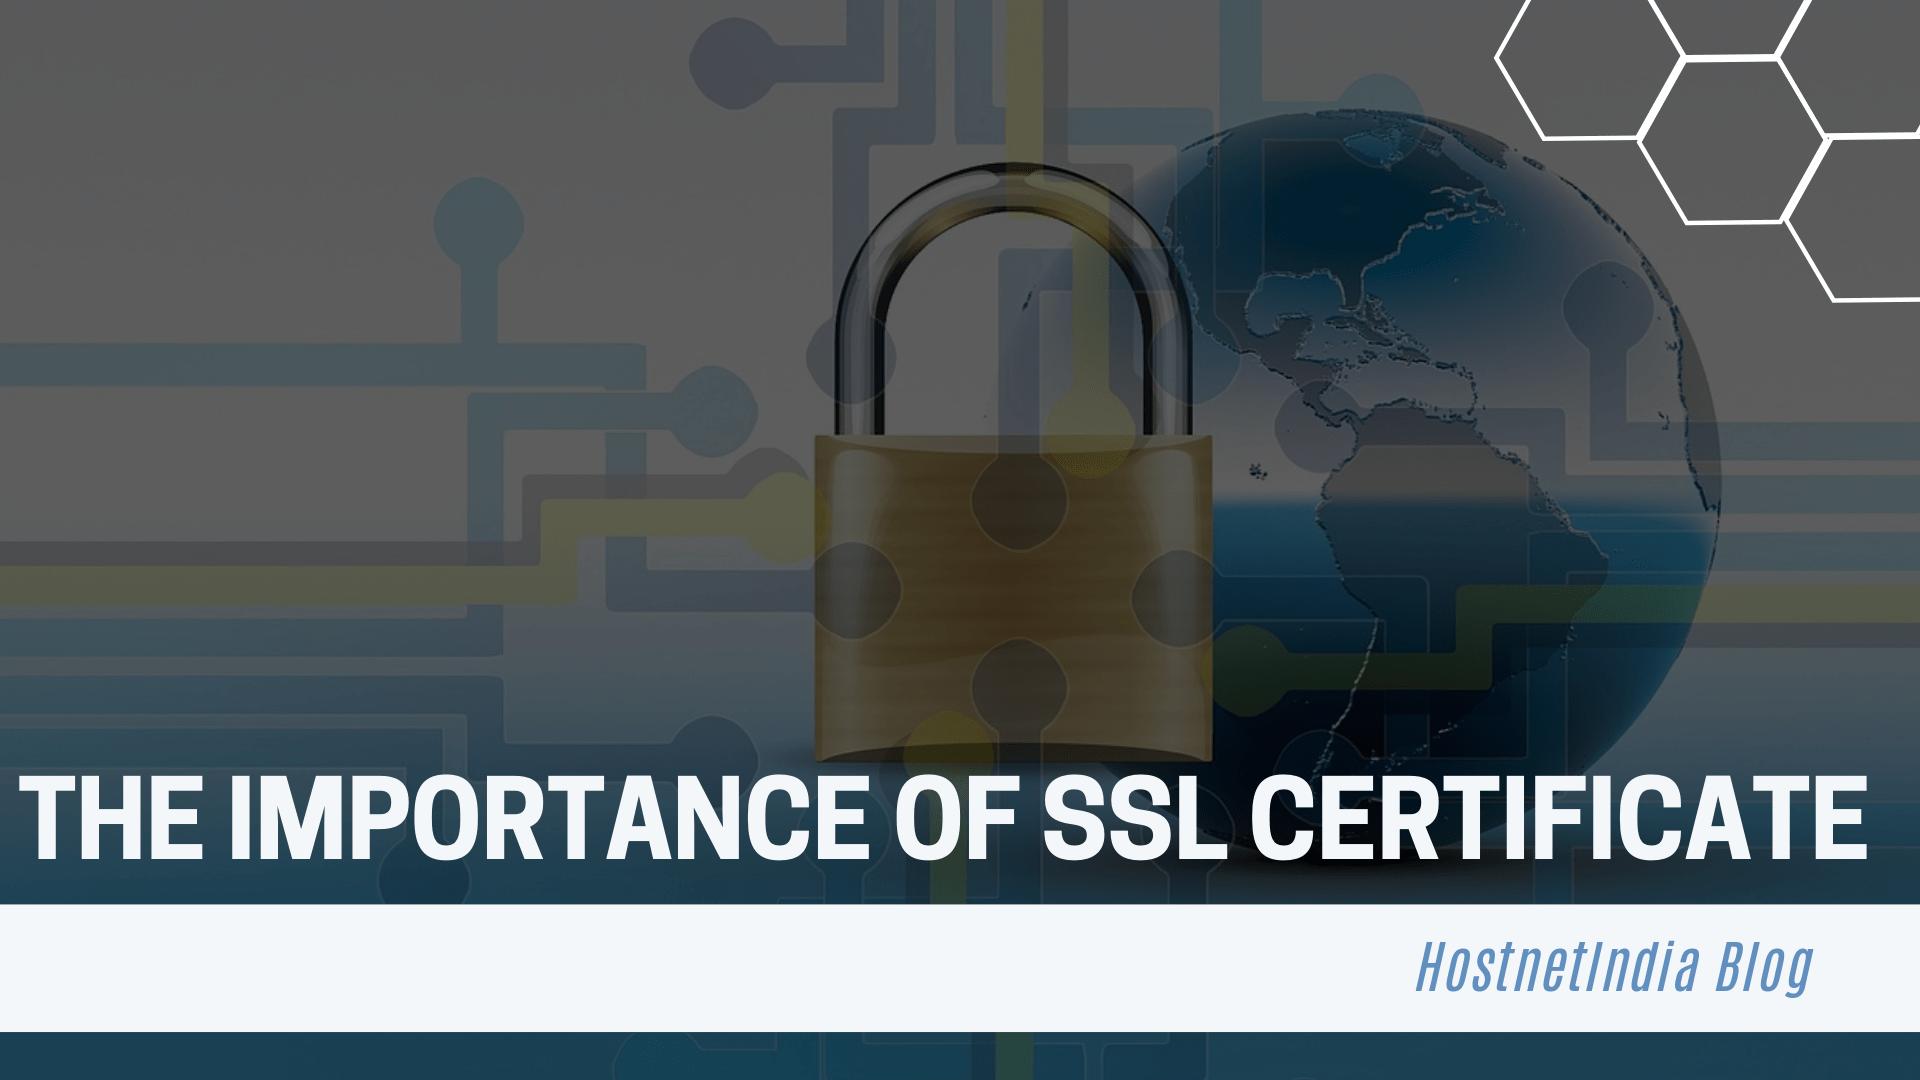 importance of ssl